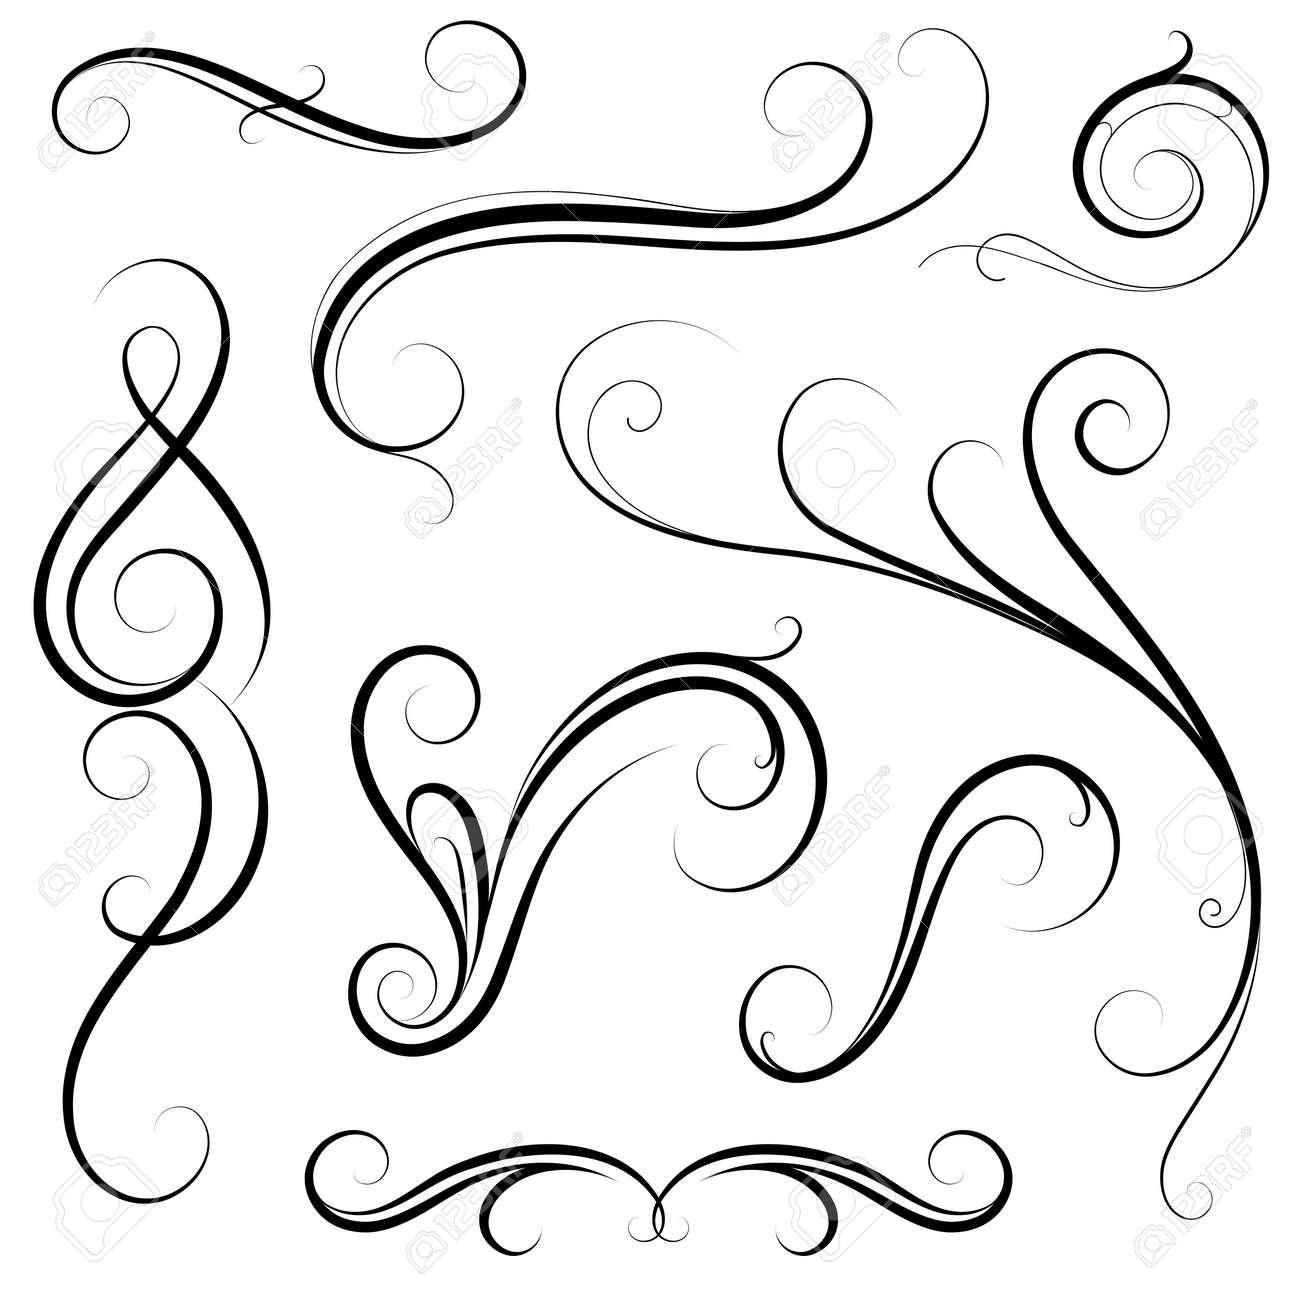 99 437 filigree stock vector illustration and royalty free filigree rh 123rf com filigree clip art free downloads filigree clipart border free